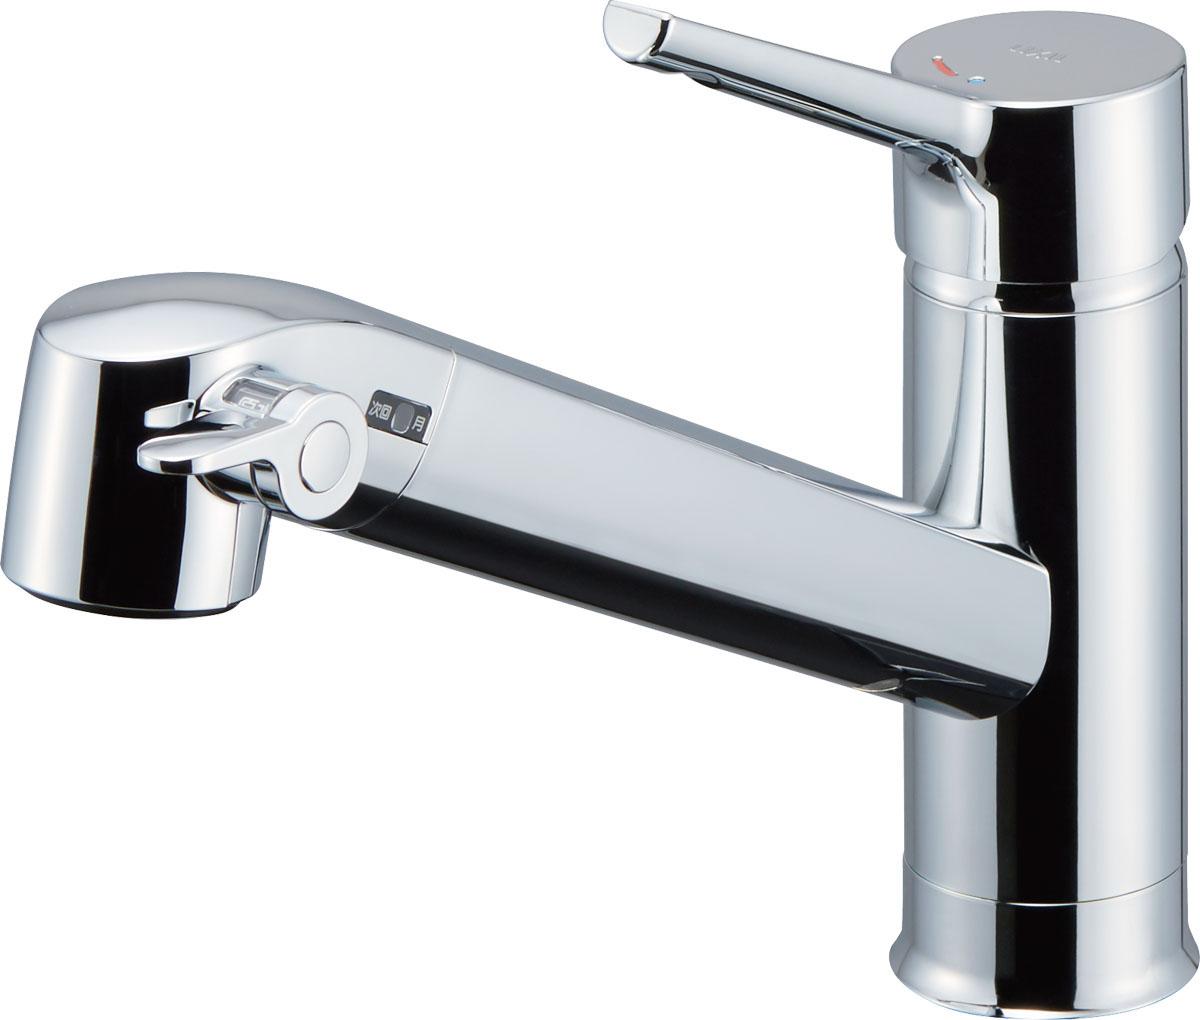 INAX LIXIL キッチン水栓 JF-AF442SYXN (JW) (寒冷地対応) オールインワン浄水栓 FSタイプ イナックス リクシル